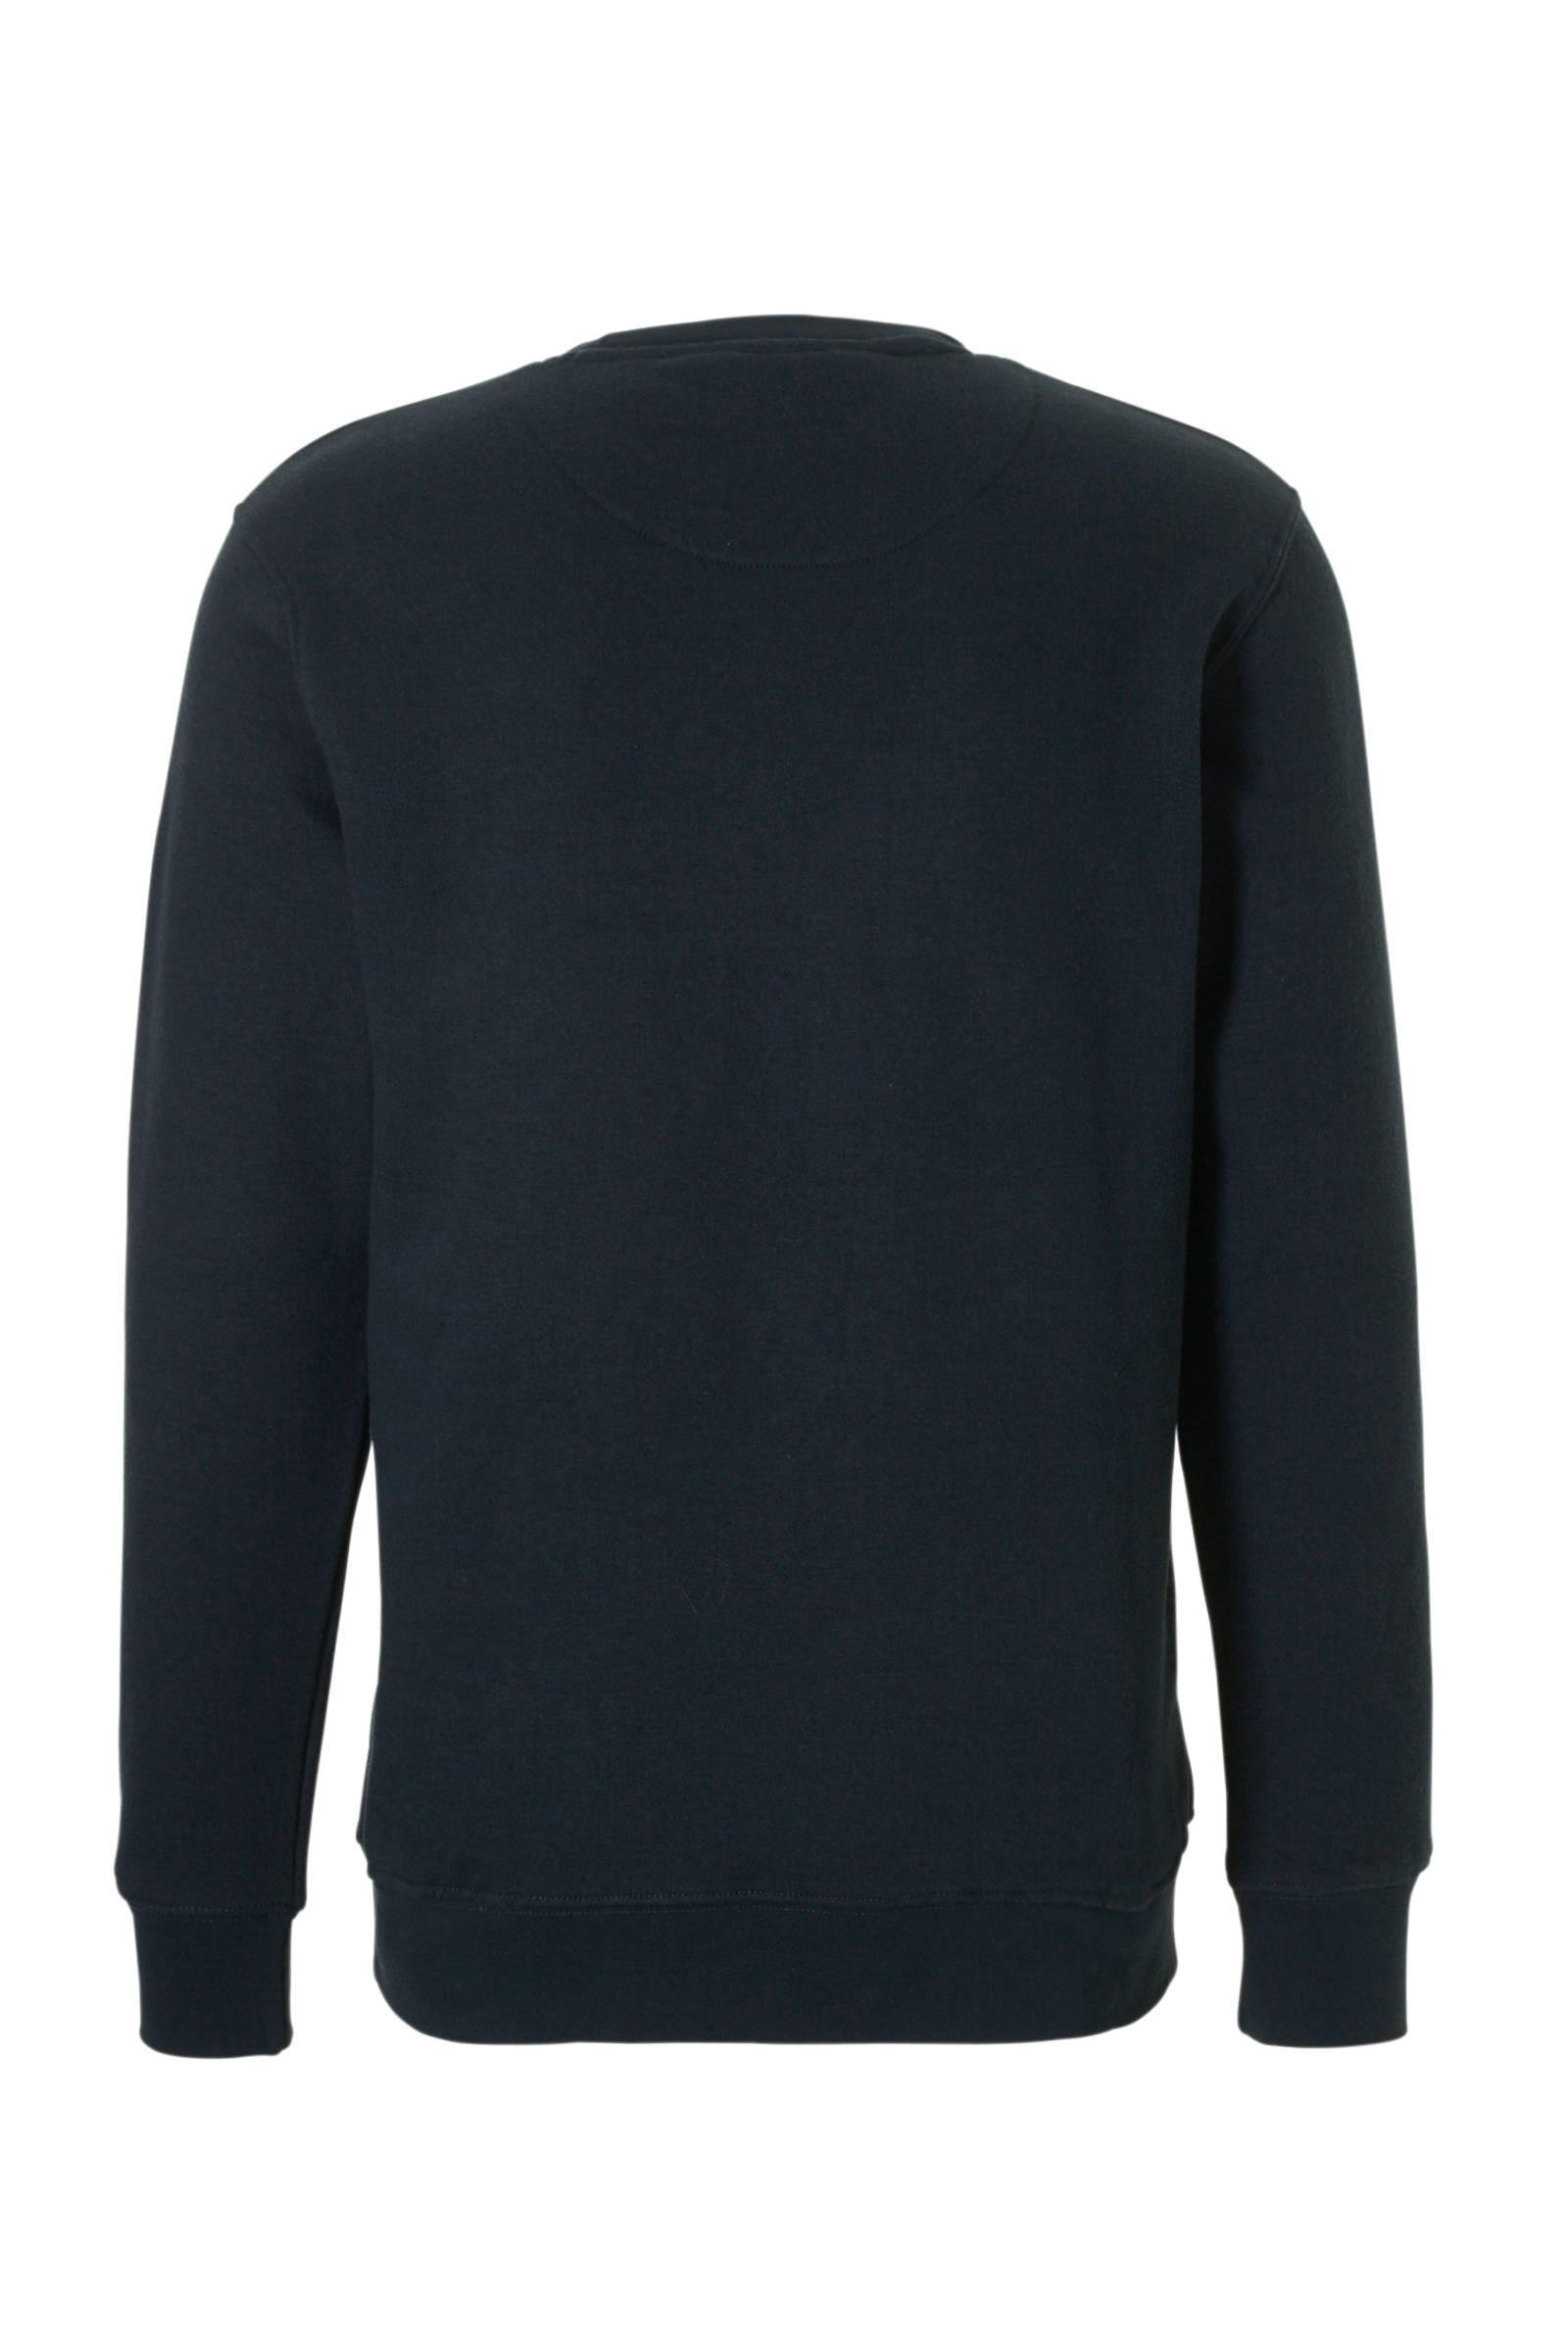 Dstrezzed sweater Dstrezzed sweater Dstrezzed EqxfwF